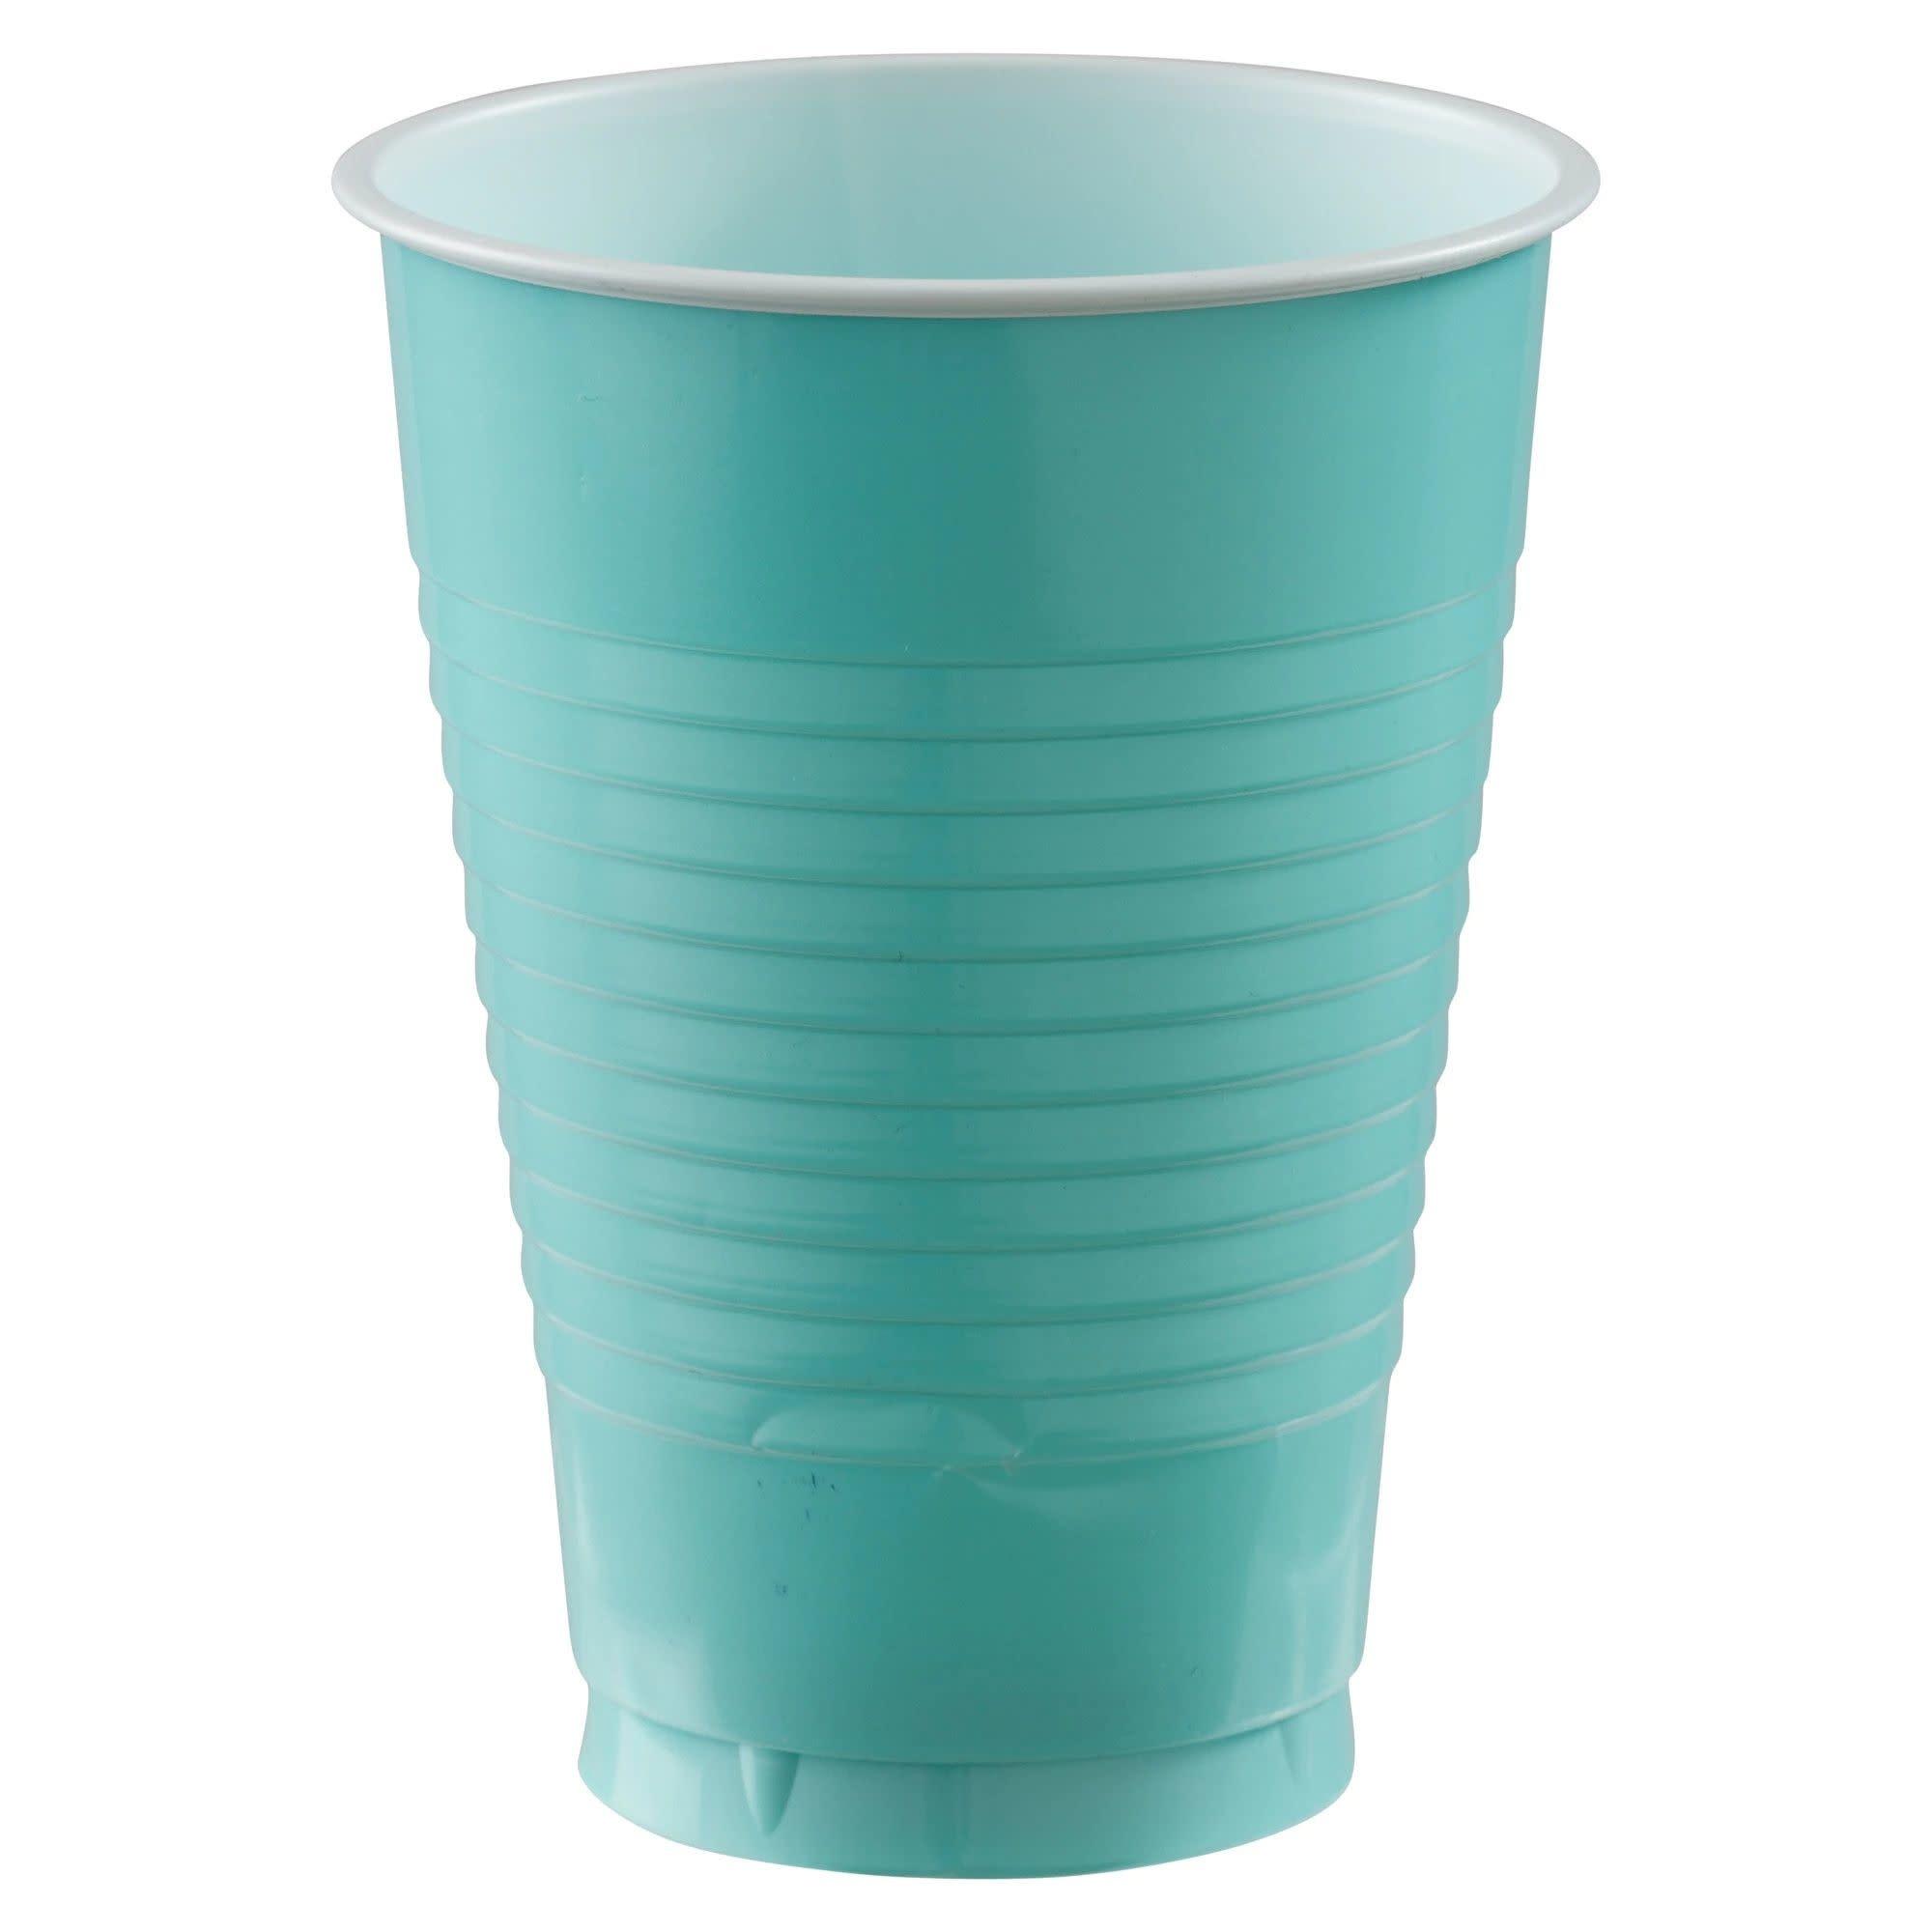 12 Oz. Plastic Cups, Mid Ct. - Robin's-Egg Blue